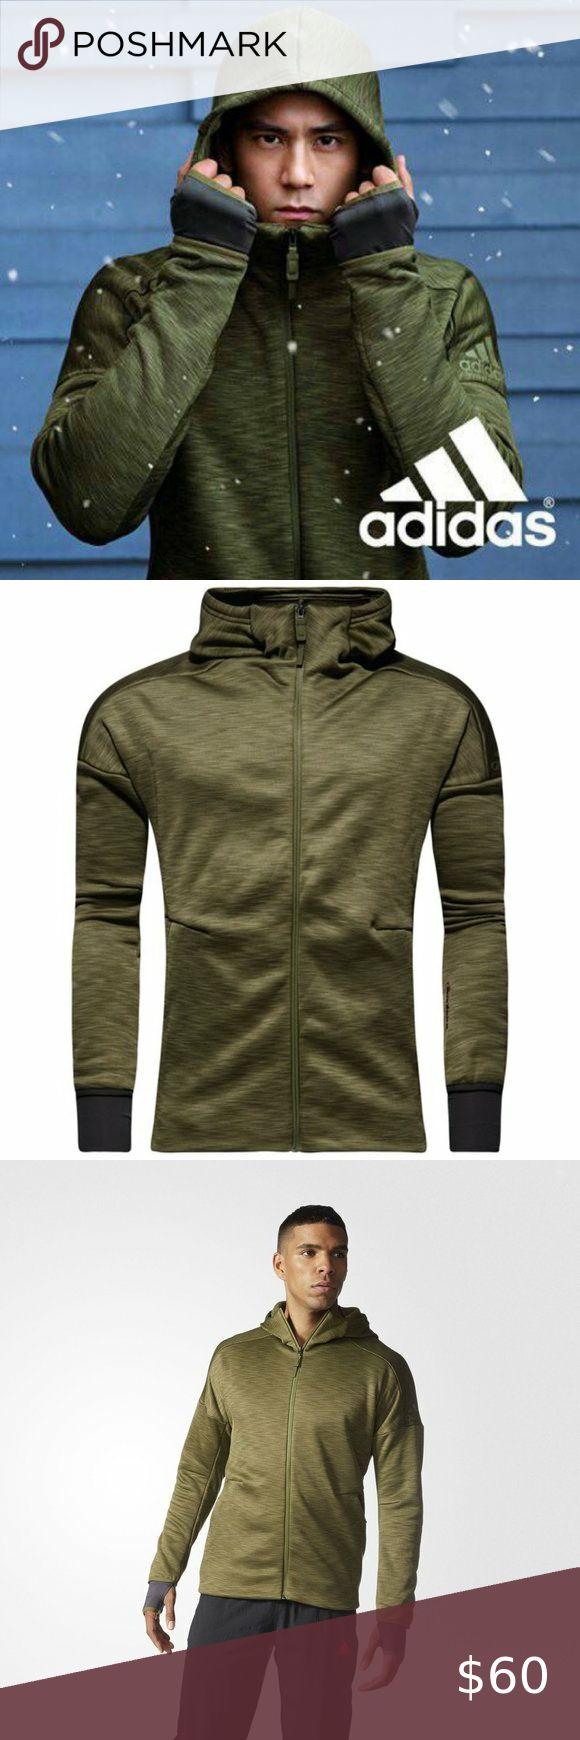 Adidas Fz Z N E Climaheat Hoodie Olive Green Sz S Hoodies Sweatshirt Shirt Adidas Shirt [ 1740 x 580 Pixel ]